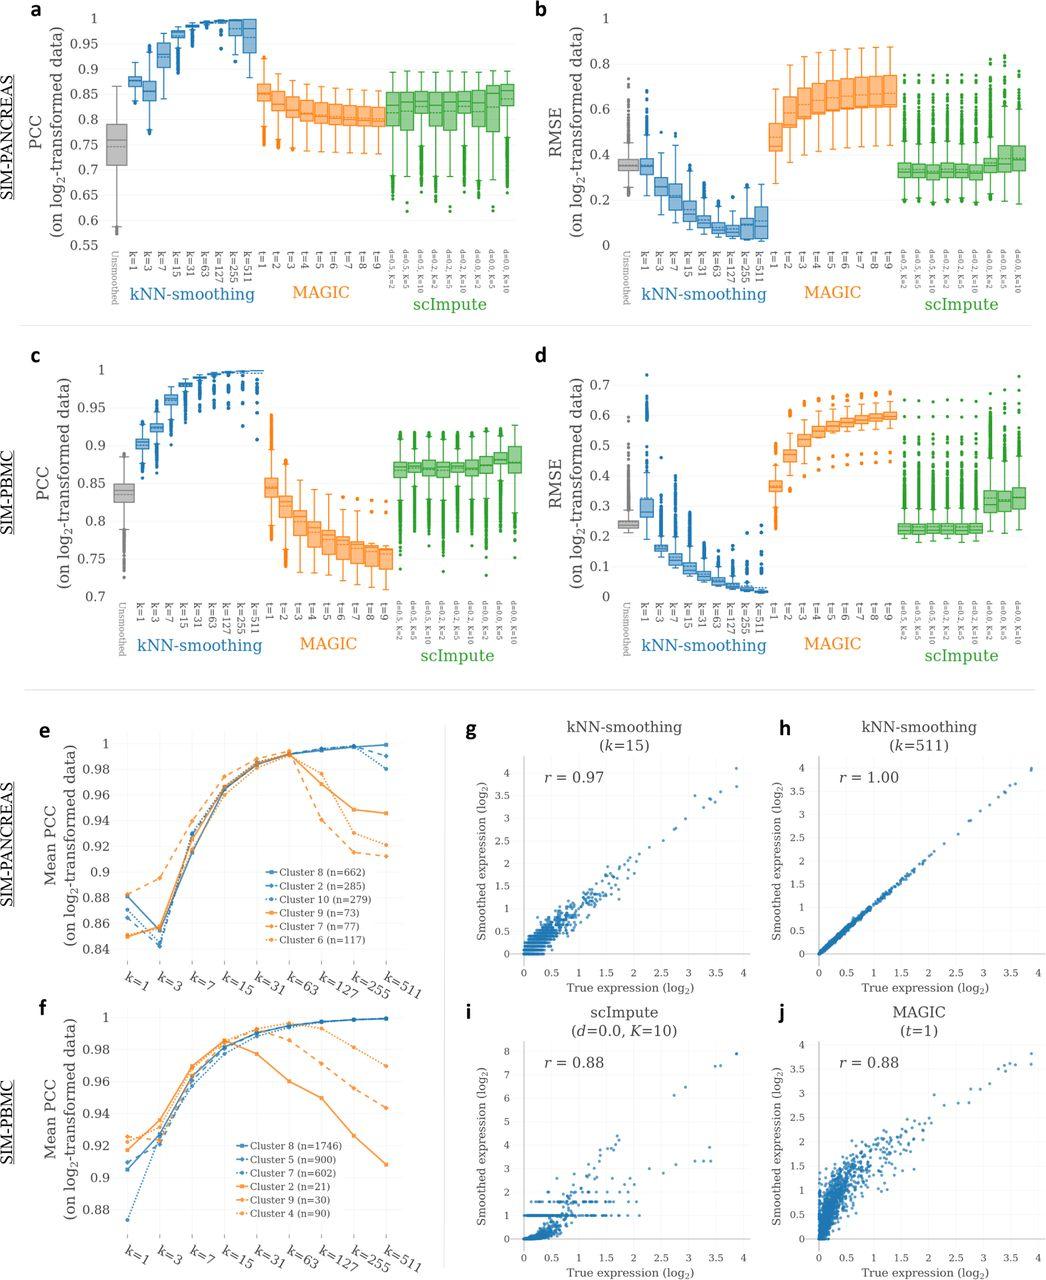 K-nearest neighbor smoothing for high-throughput single-cell RNA-Seq